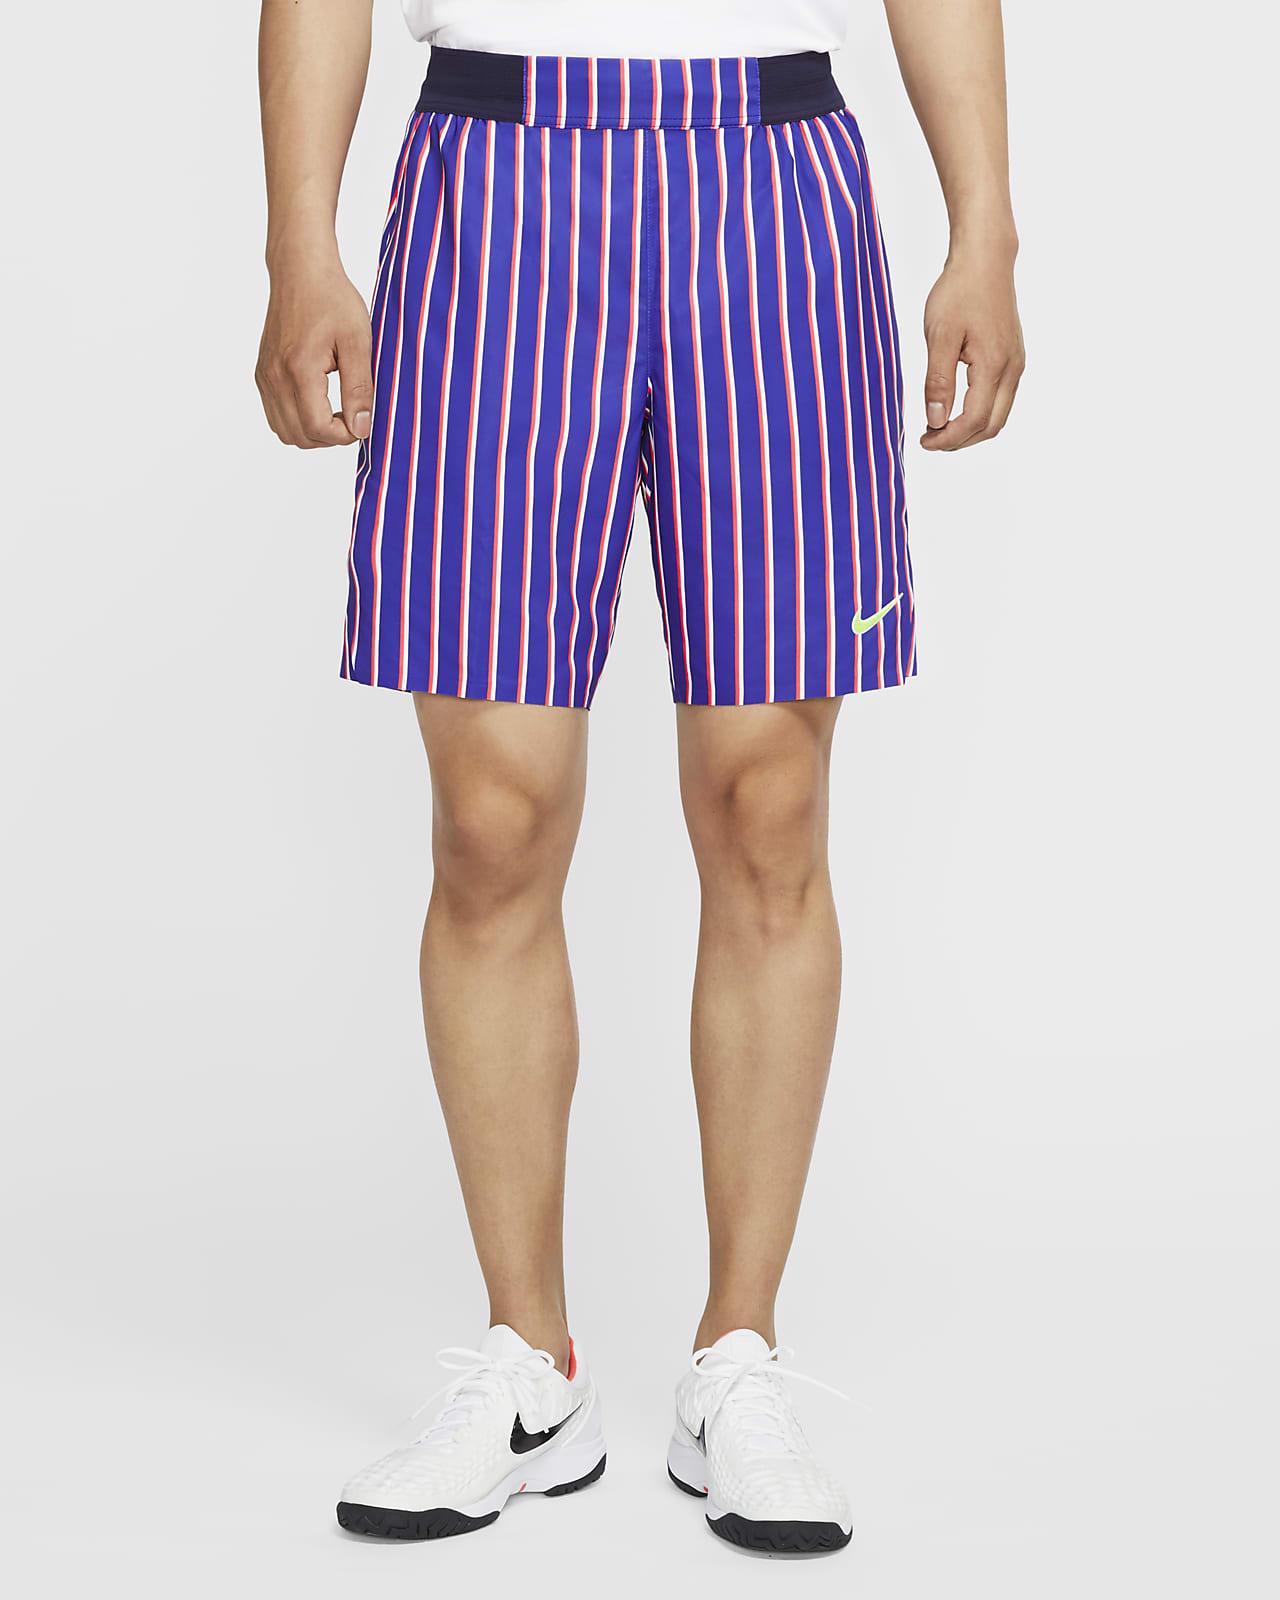 NikeCourt Slam Men's Tennis Shorts